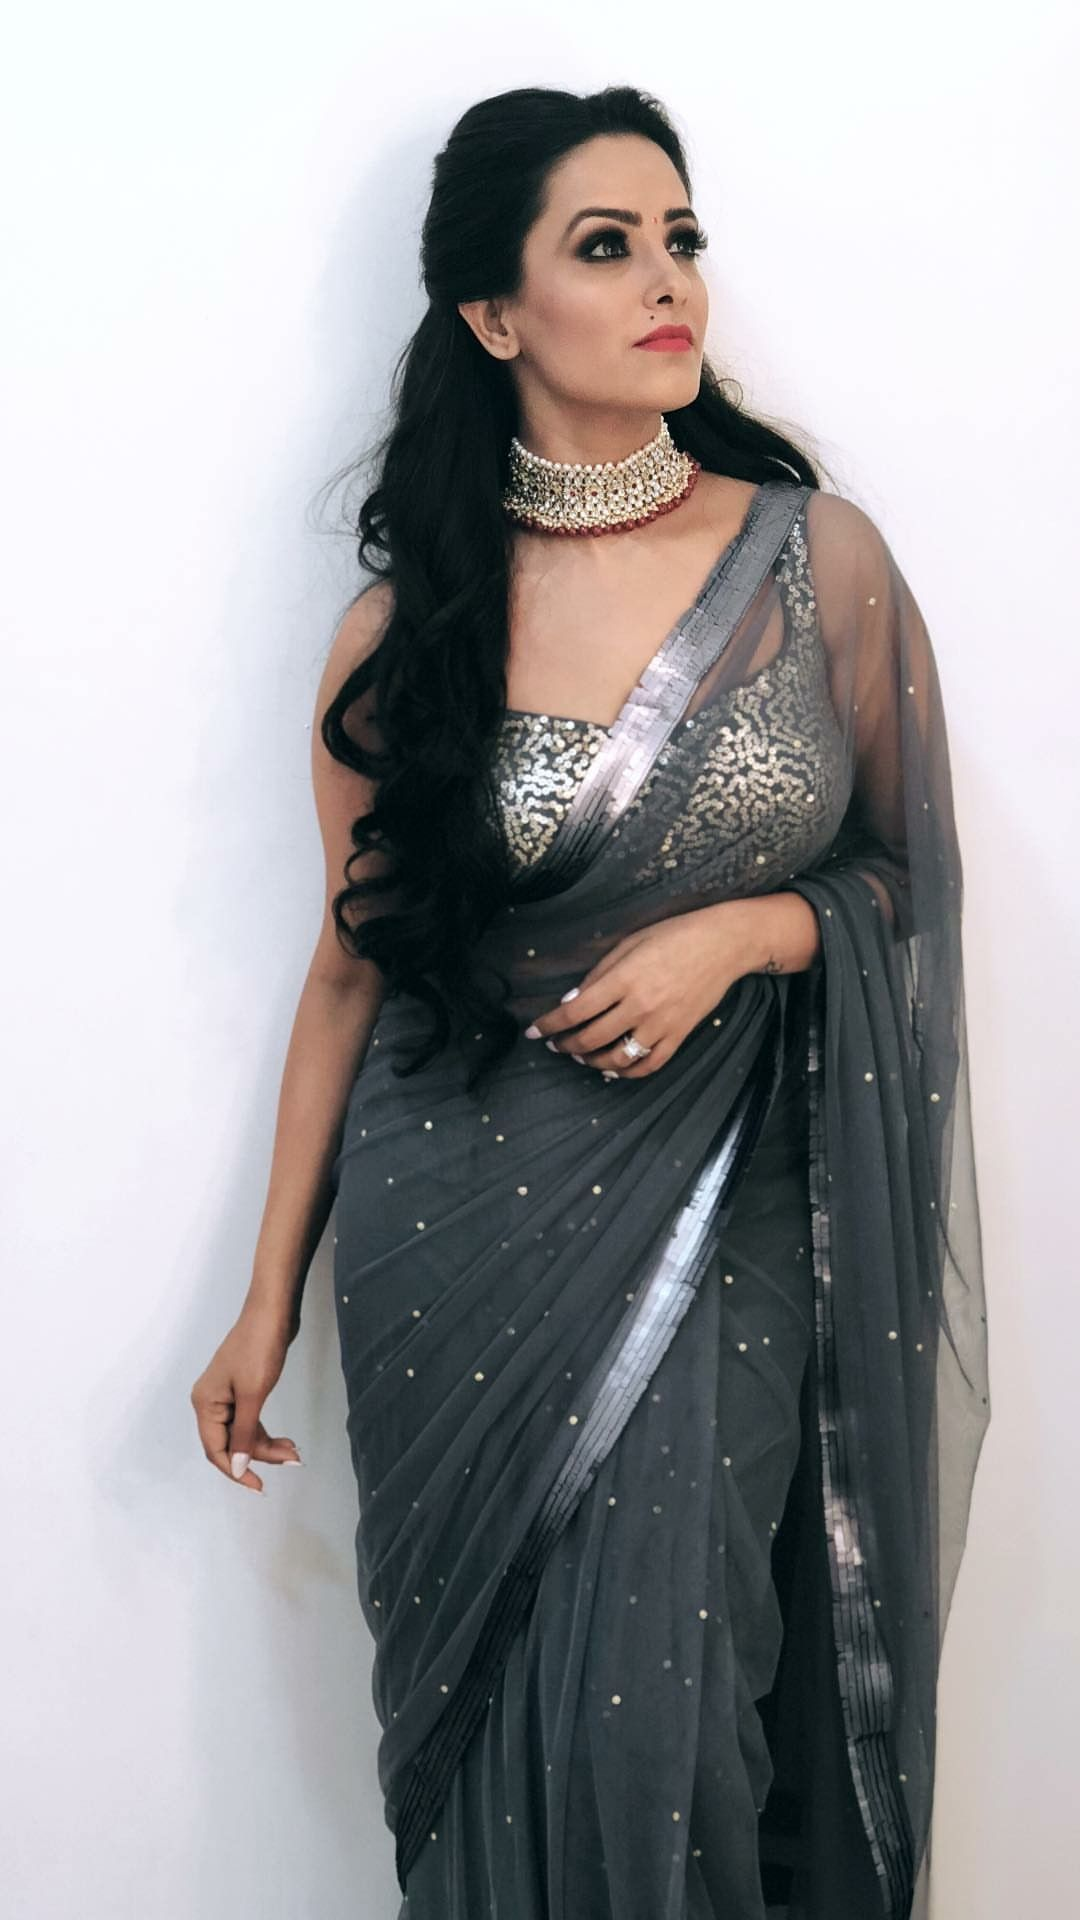 f3788e63bf ANITA HASSANANDANI | TV Celebs in 2019 | Saree, Saree look, Saree models